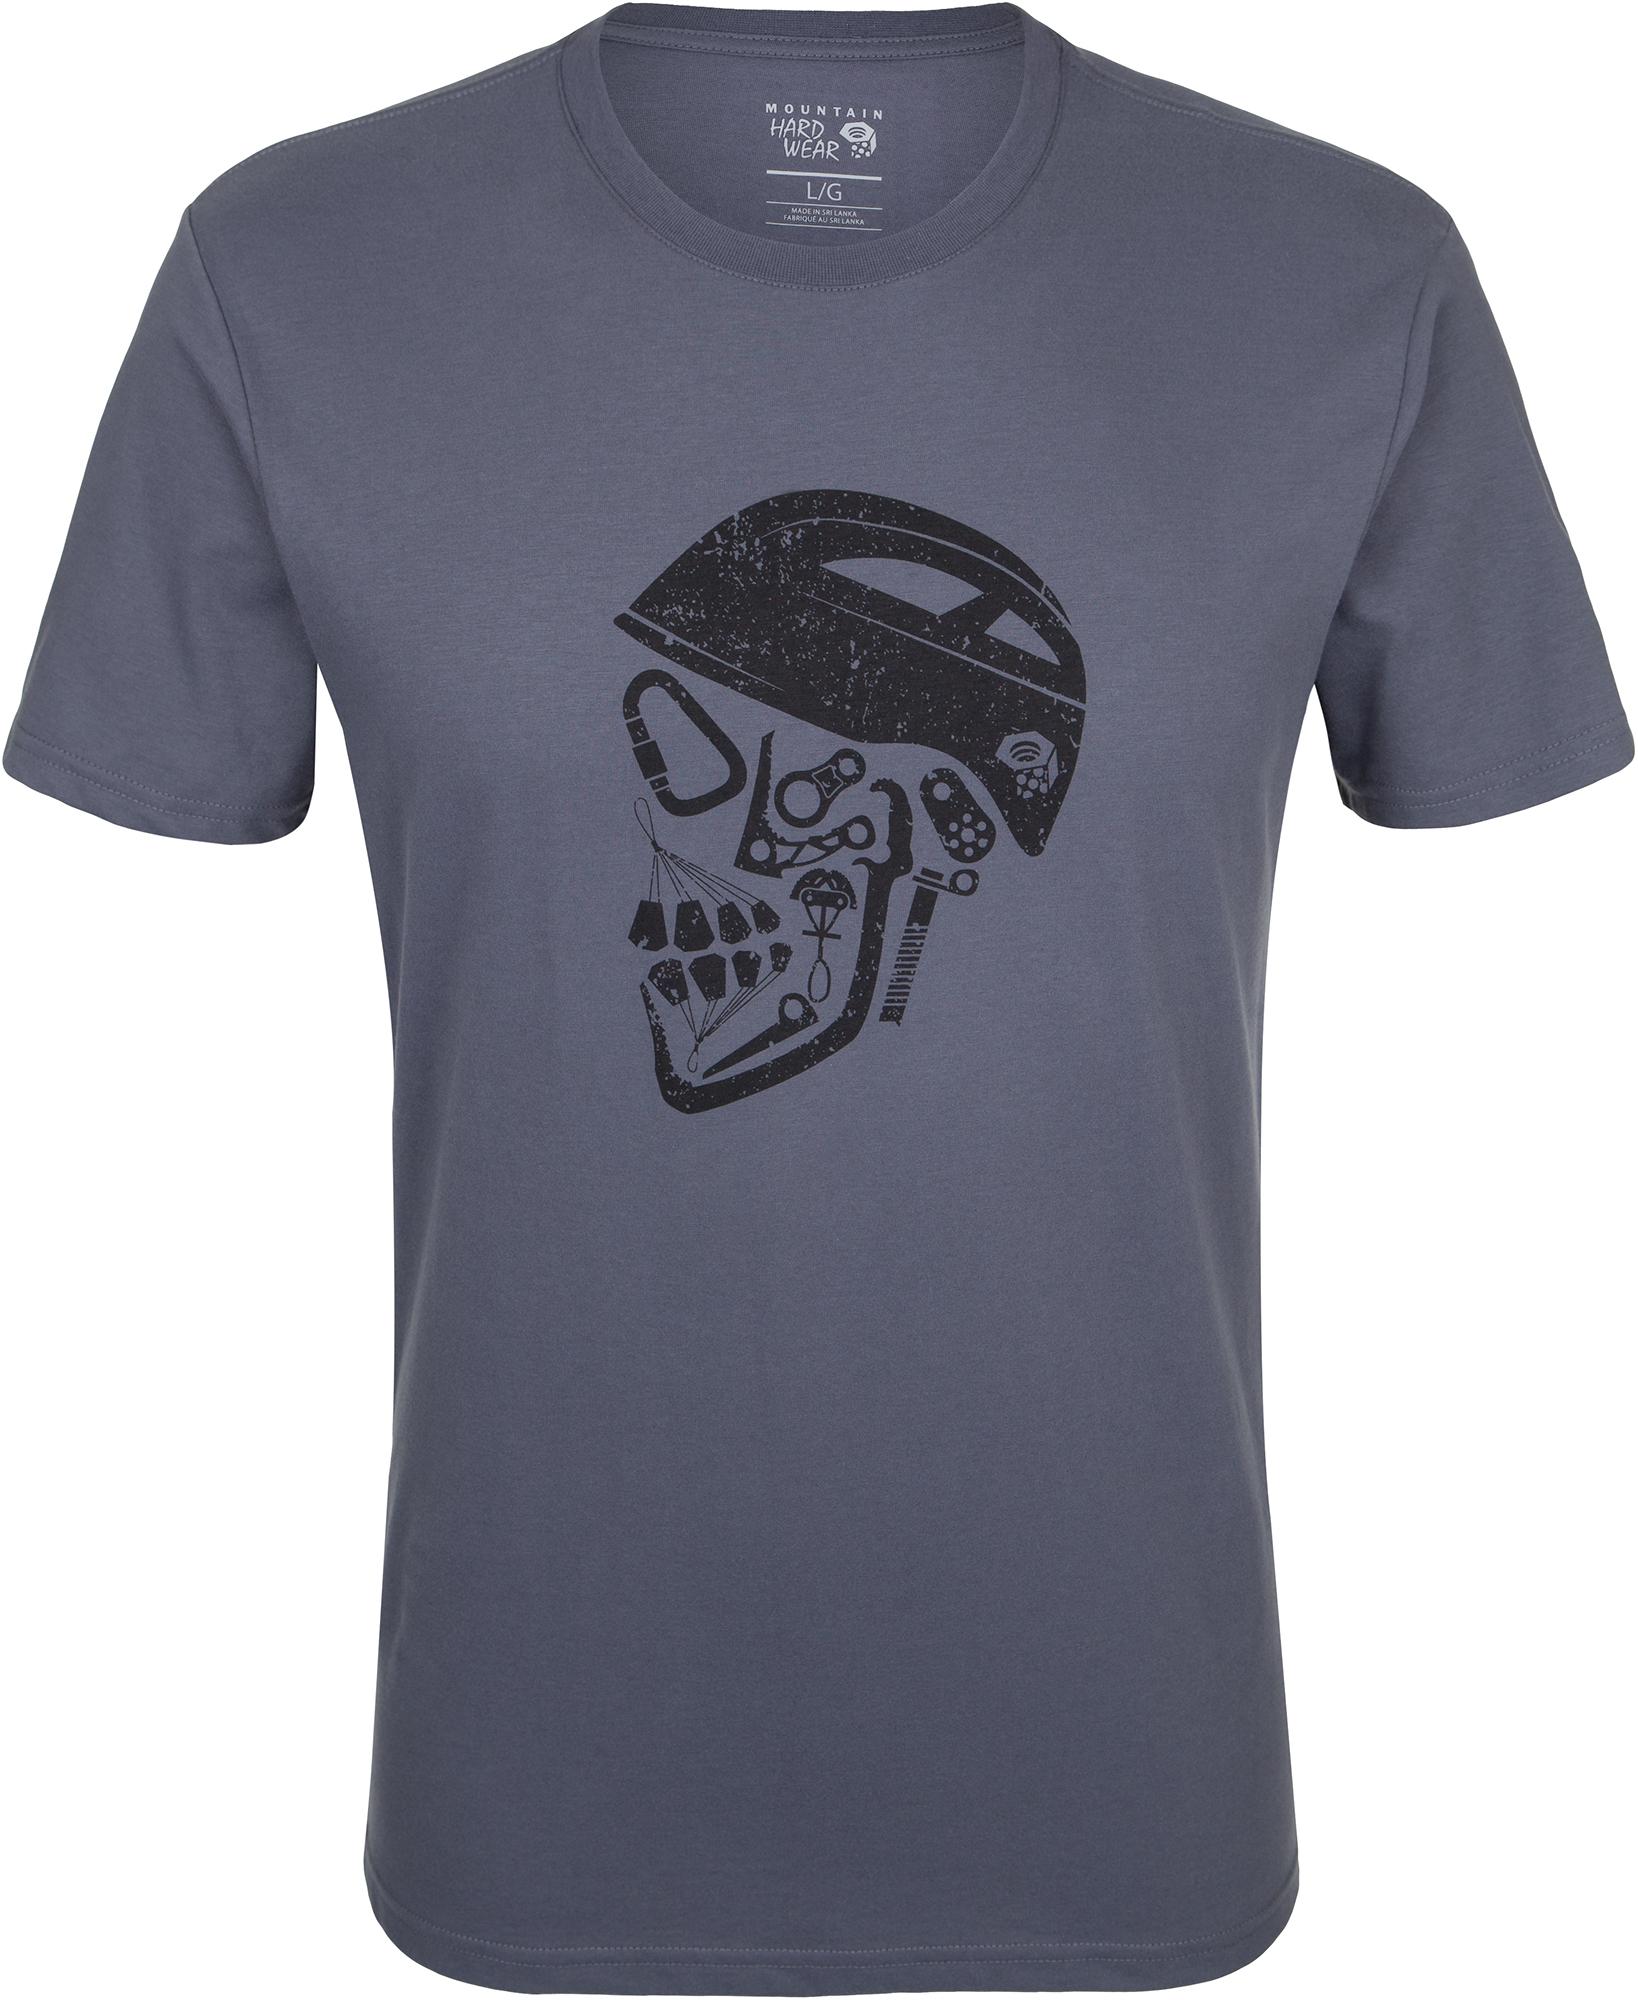 Mountain Hardwear Футболка мужская X-Ray, размер 56